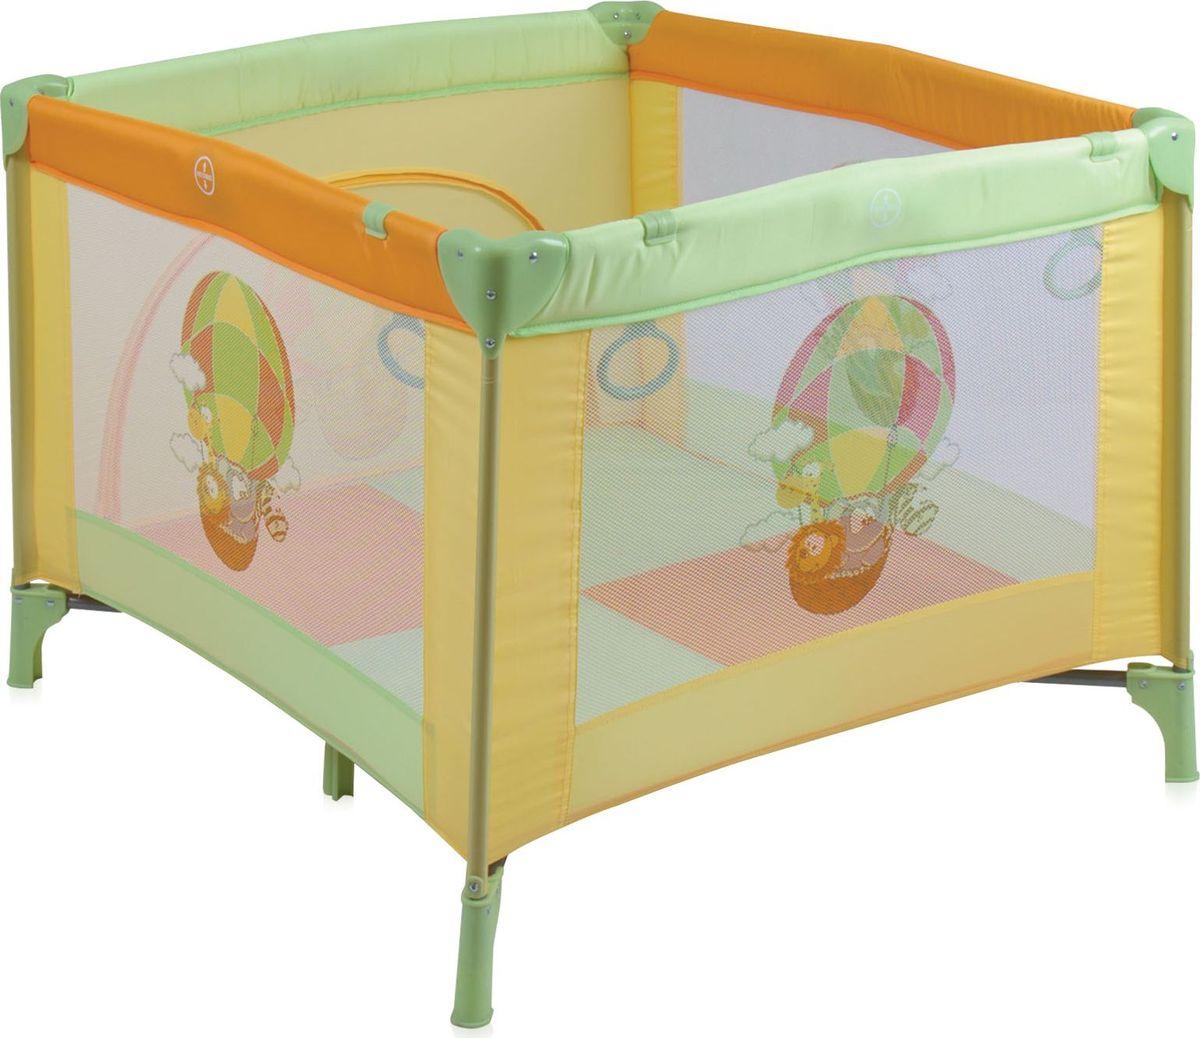 Lorelli Манеж Play Station цвет желтый салатовый -  Детская комната